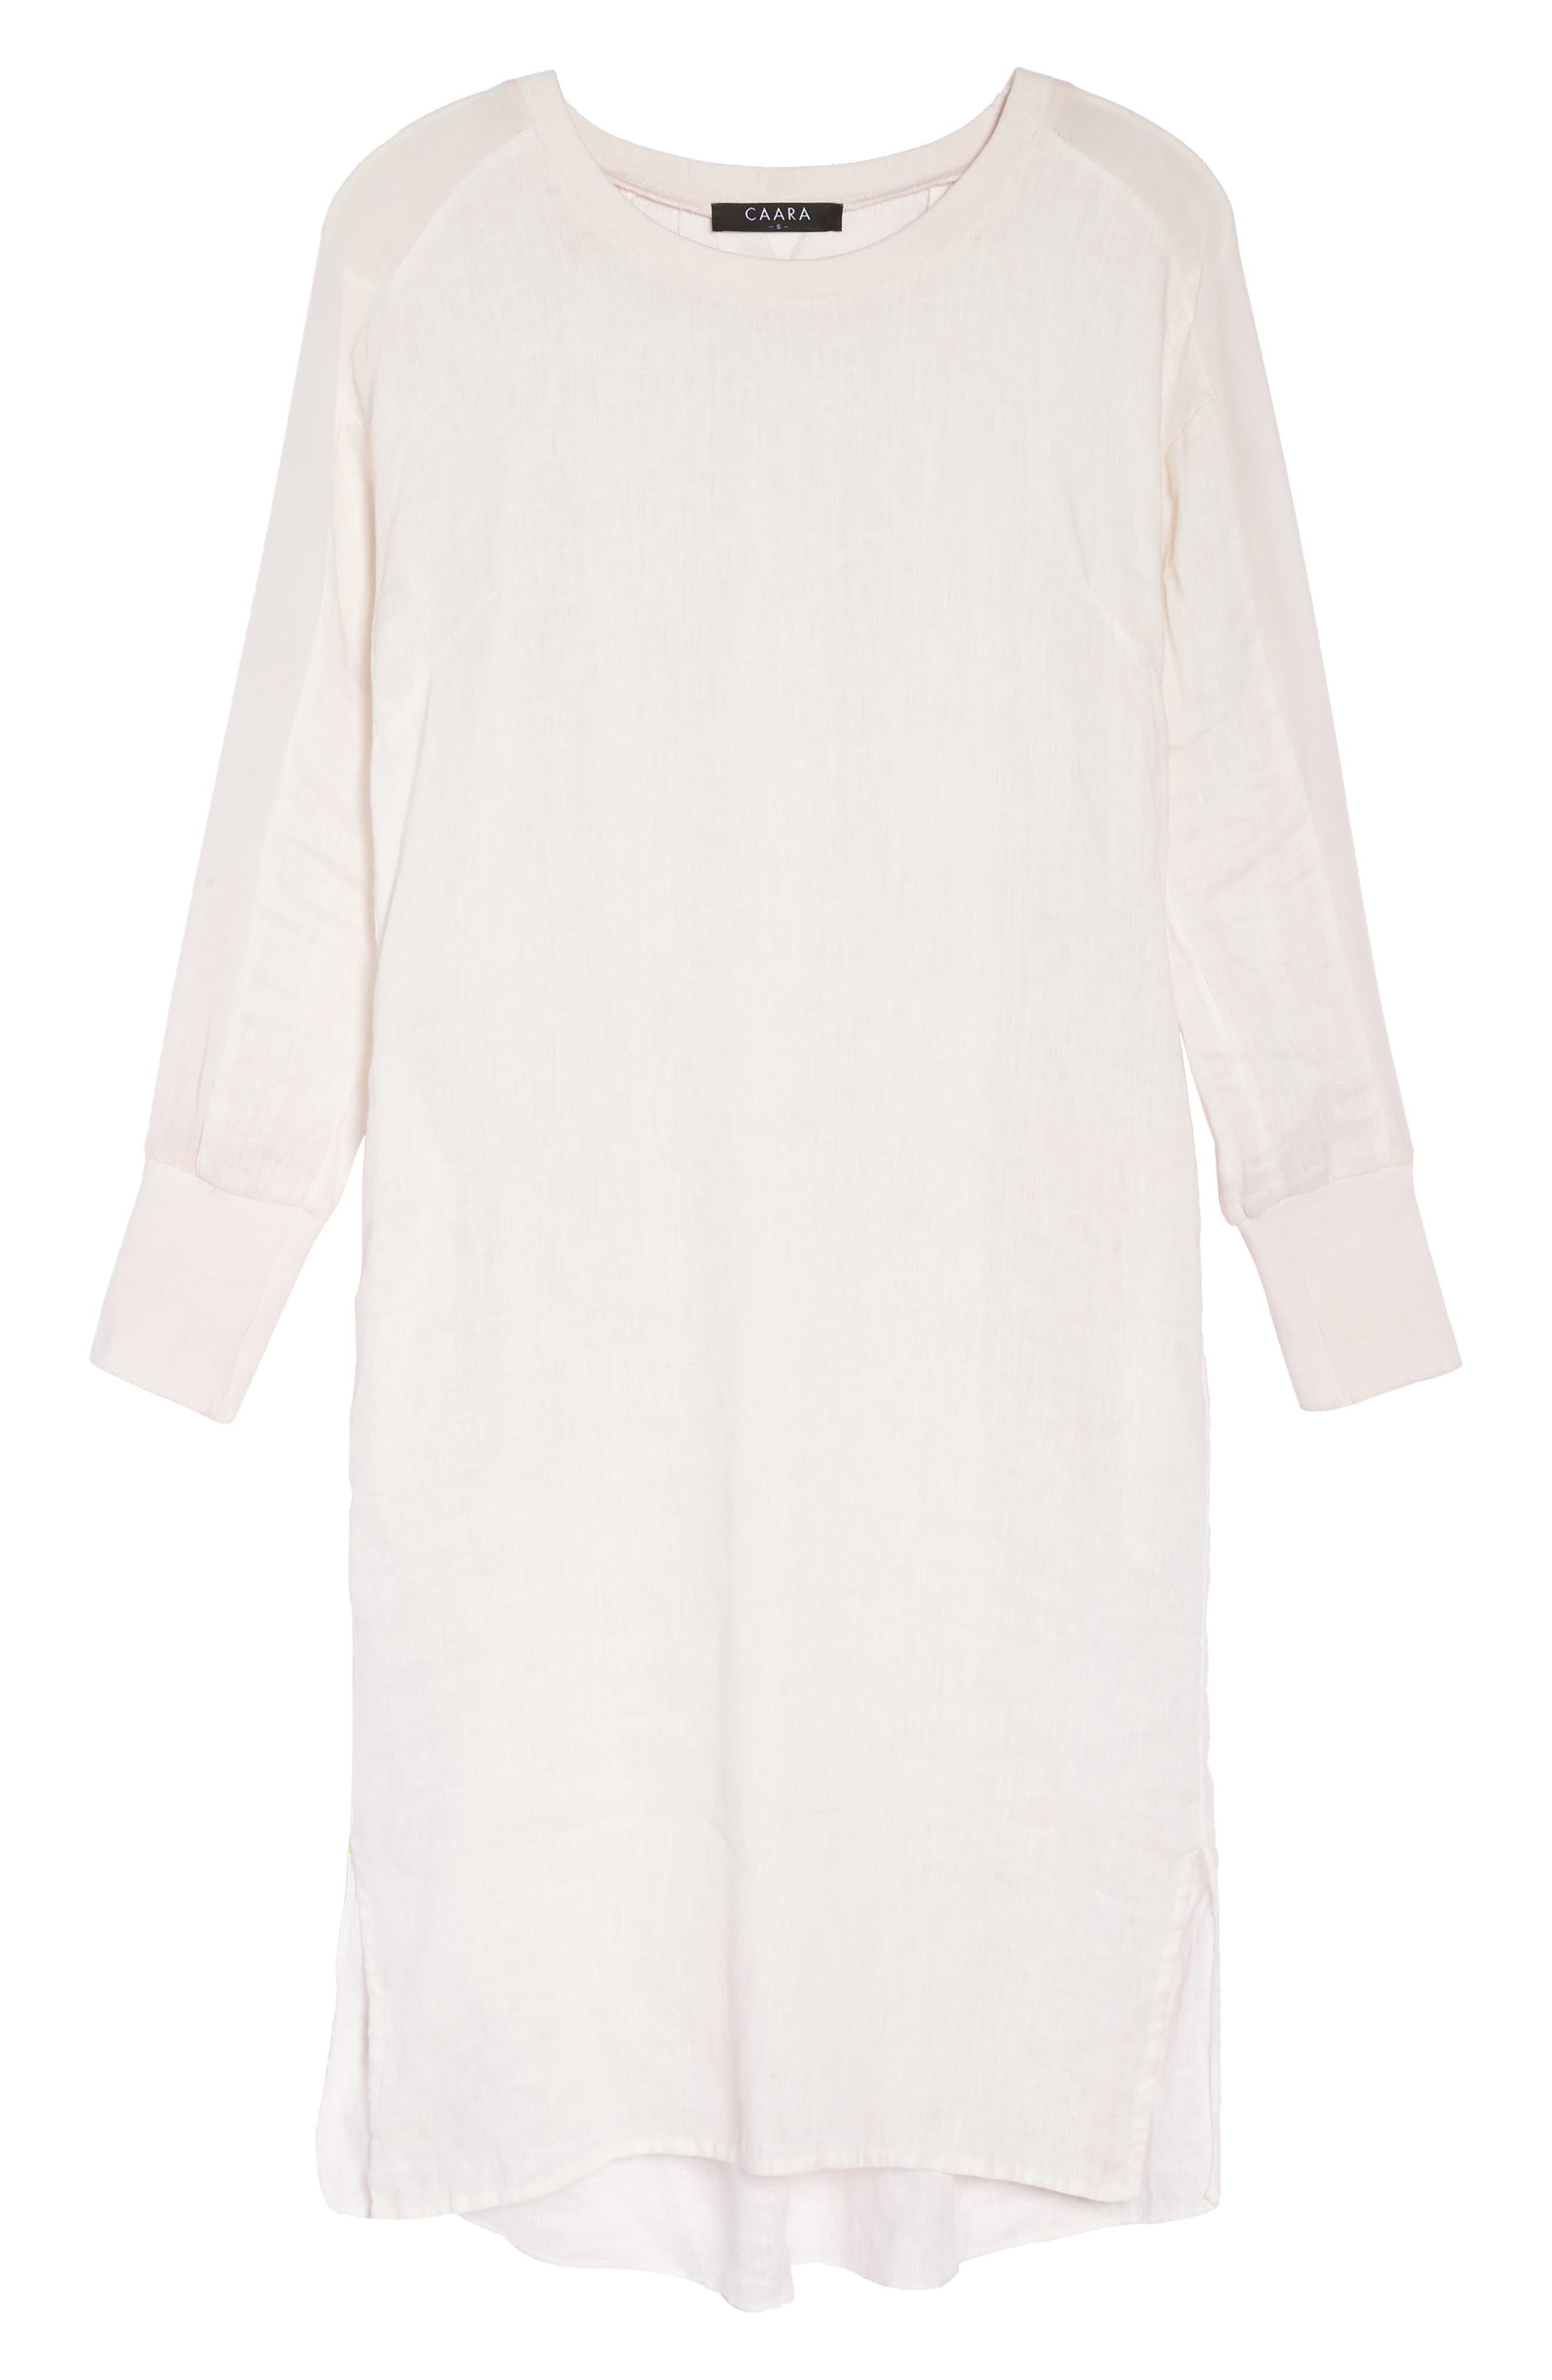 Rata Linen Shift Dress,                             Alternate thumbnail 7, color,                             Light Pink